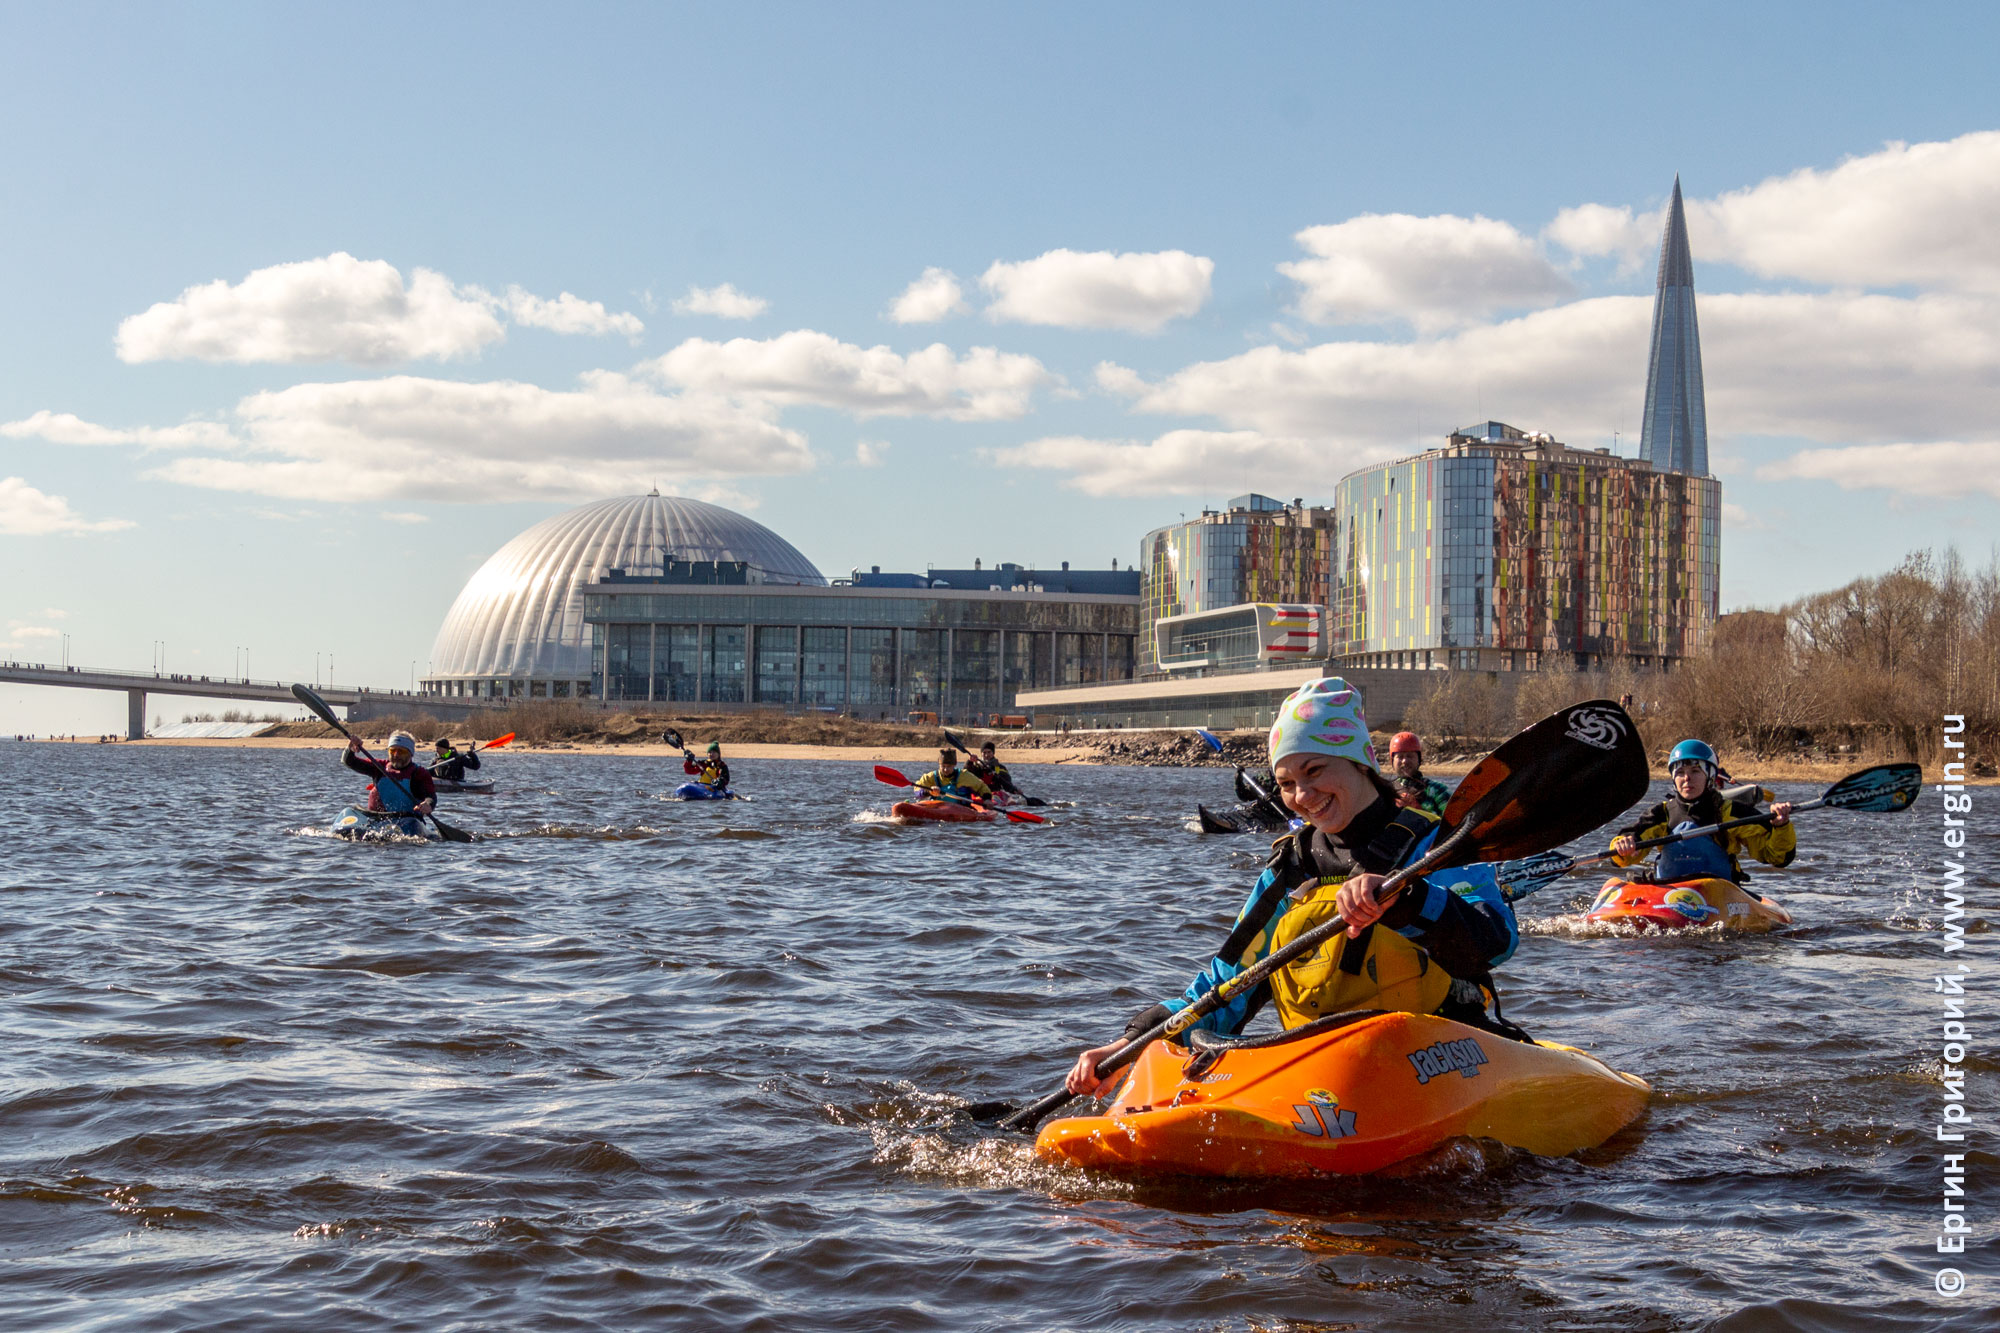 Каякеры возле аквапарка Питерлэнд в Санкт-Петербурге